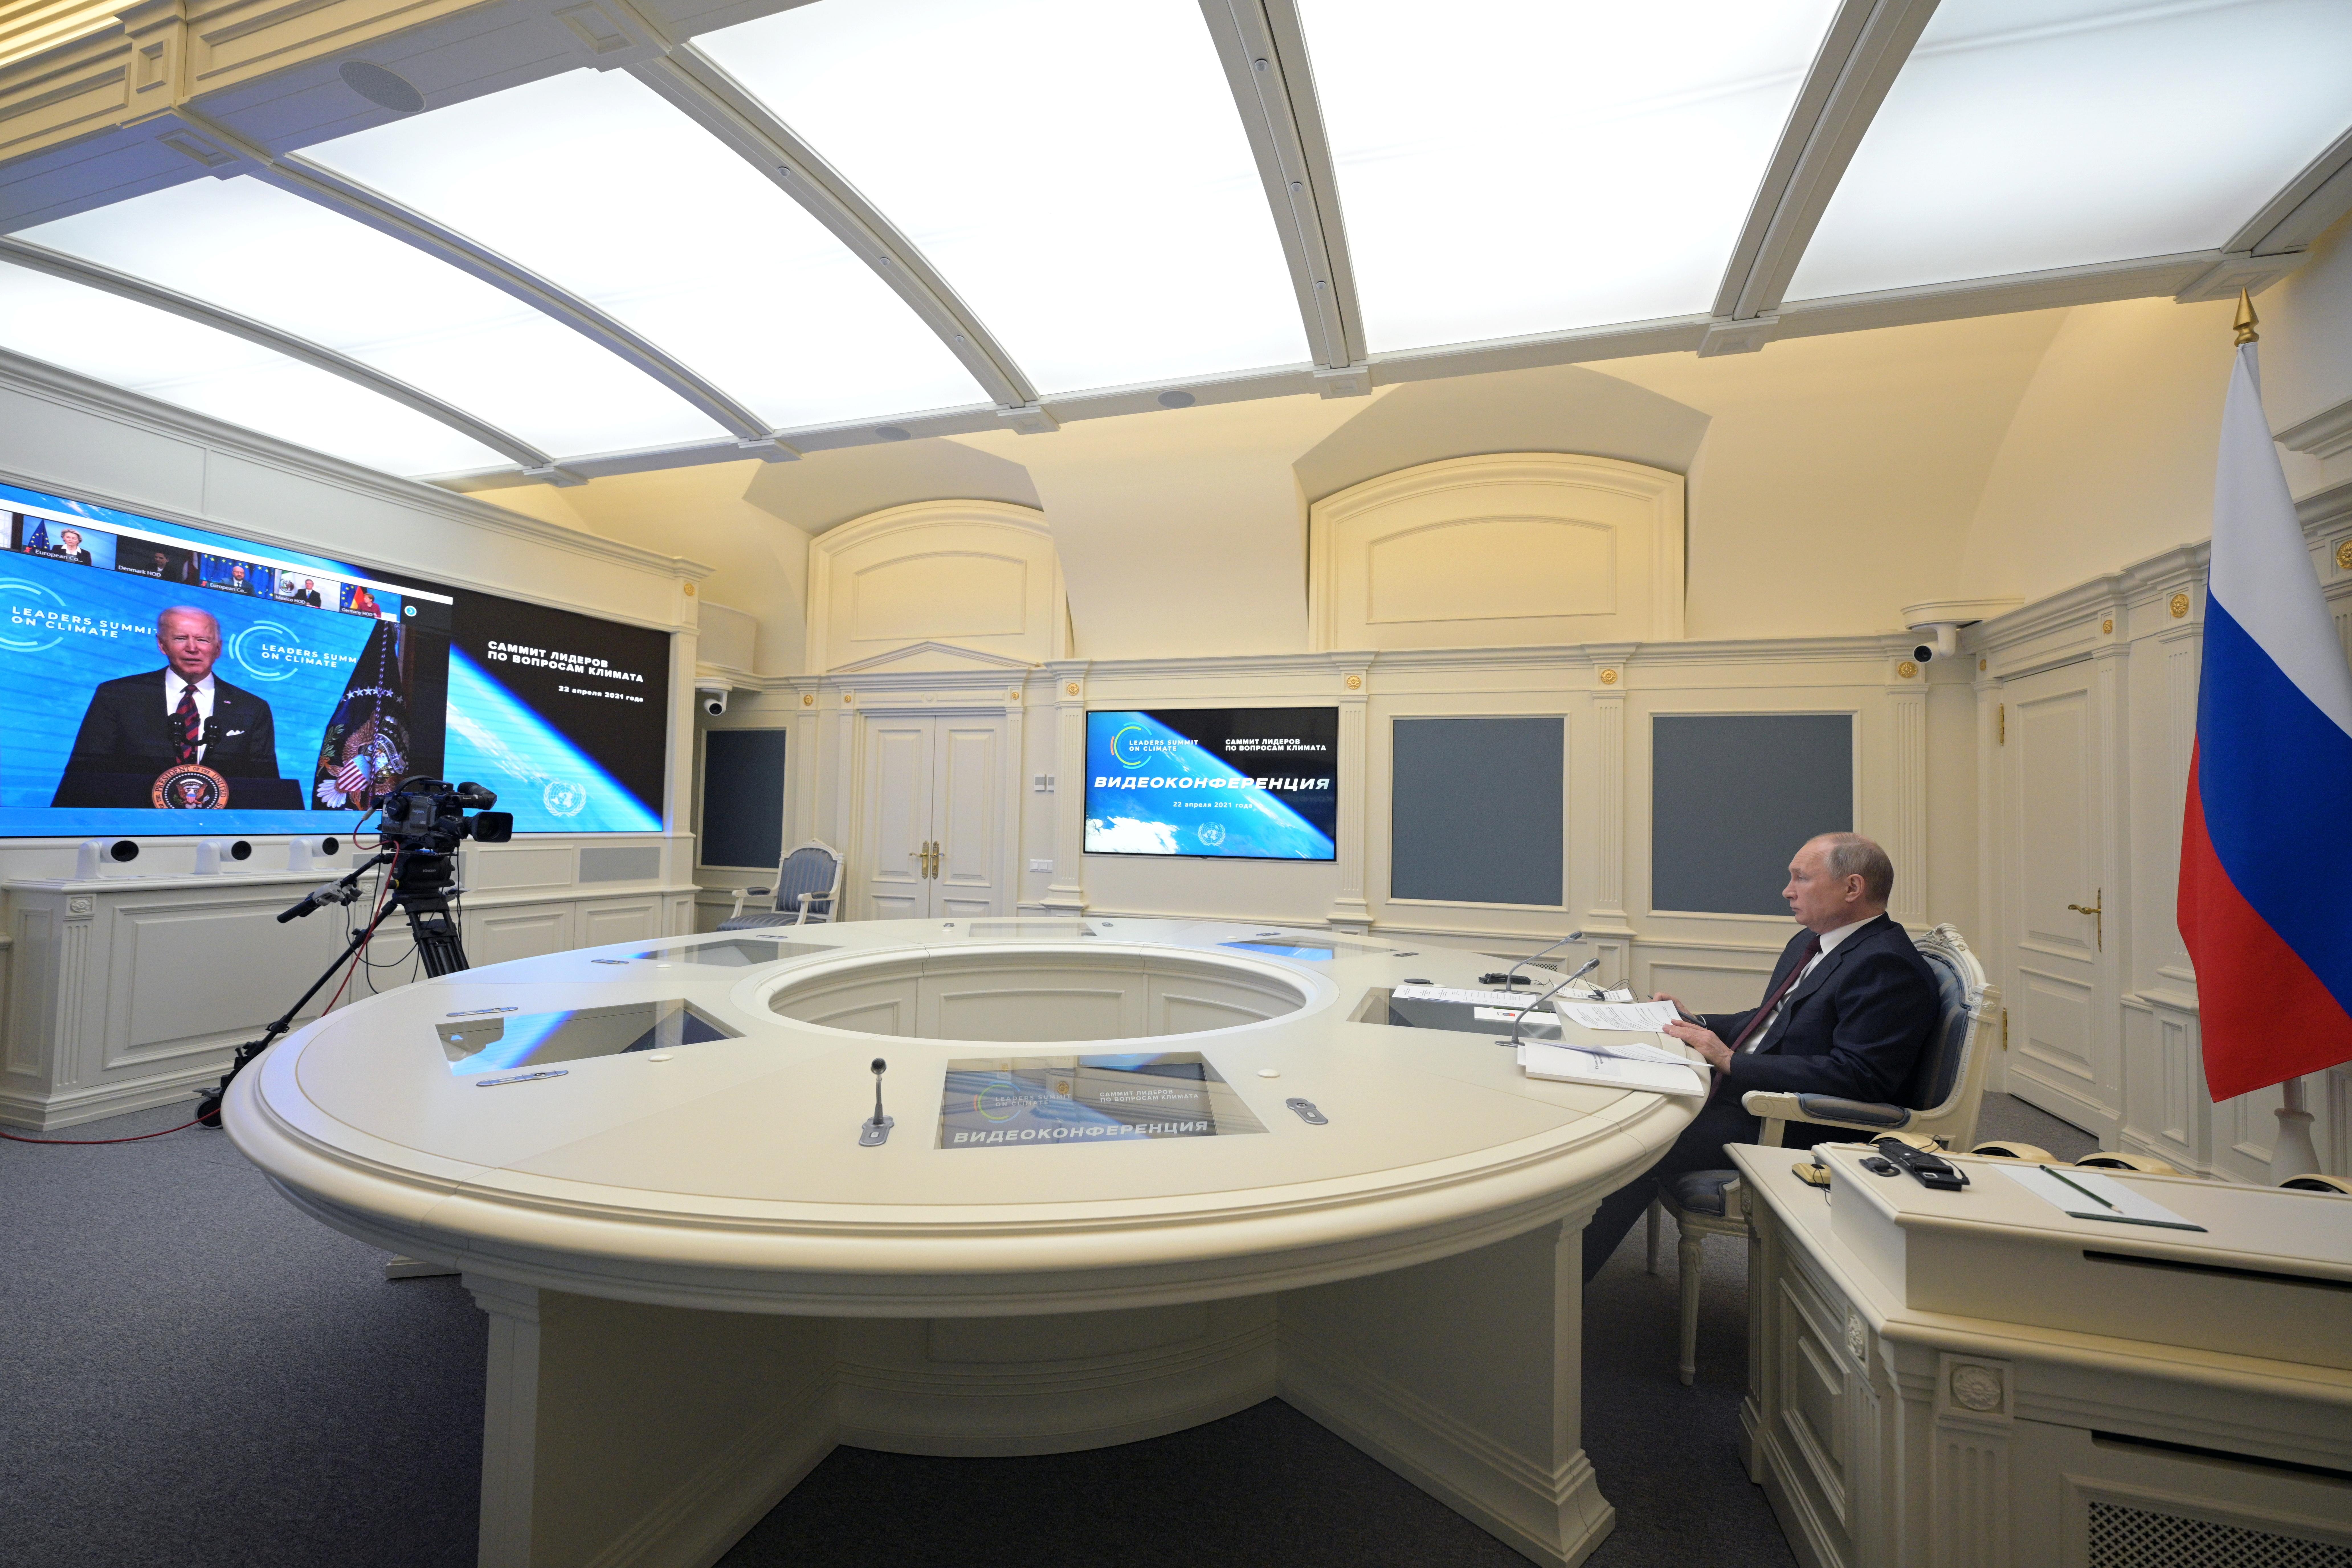 Russian President Vladimir Putin listens to U.S. President Joe Biden as he attends a virtual global climate summit via a video link in Moscow, Russia April 22, 2021. Sputnik/Alexei Druzhinin/Kremlin via REUTERS